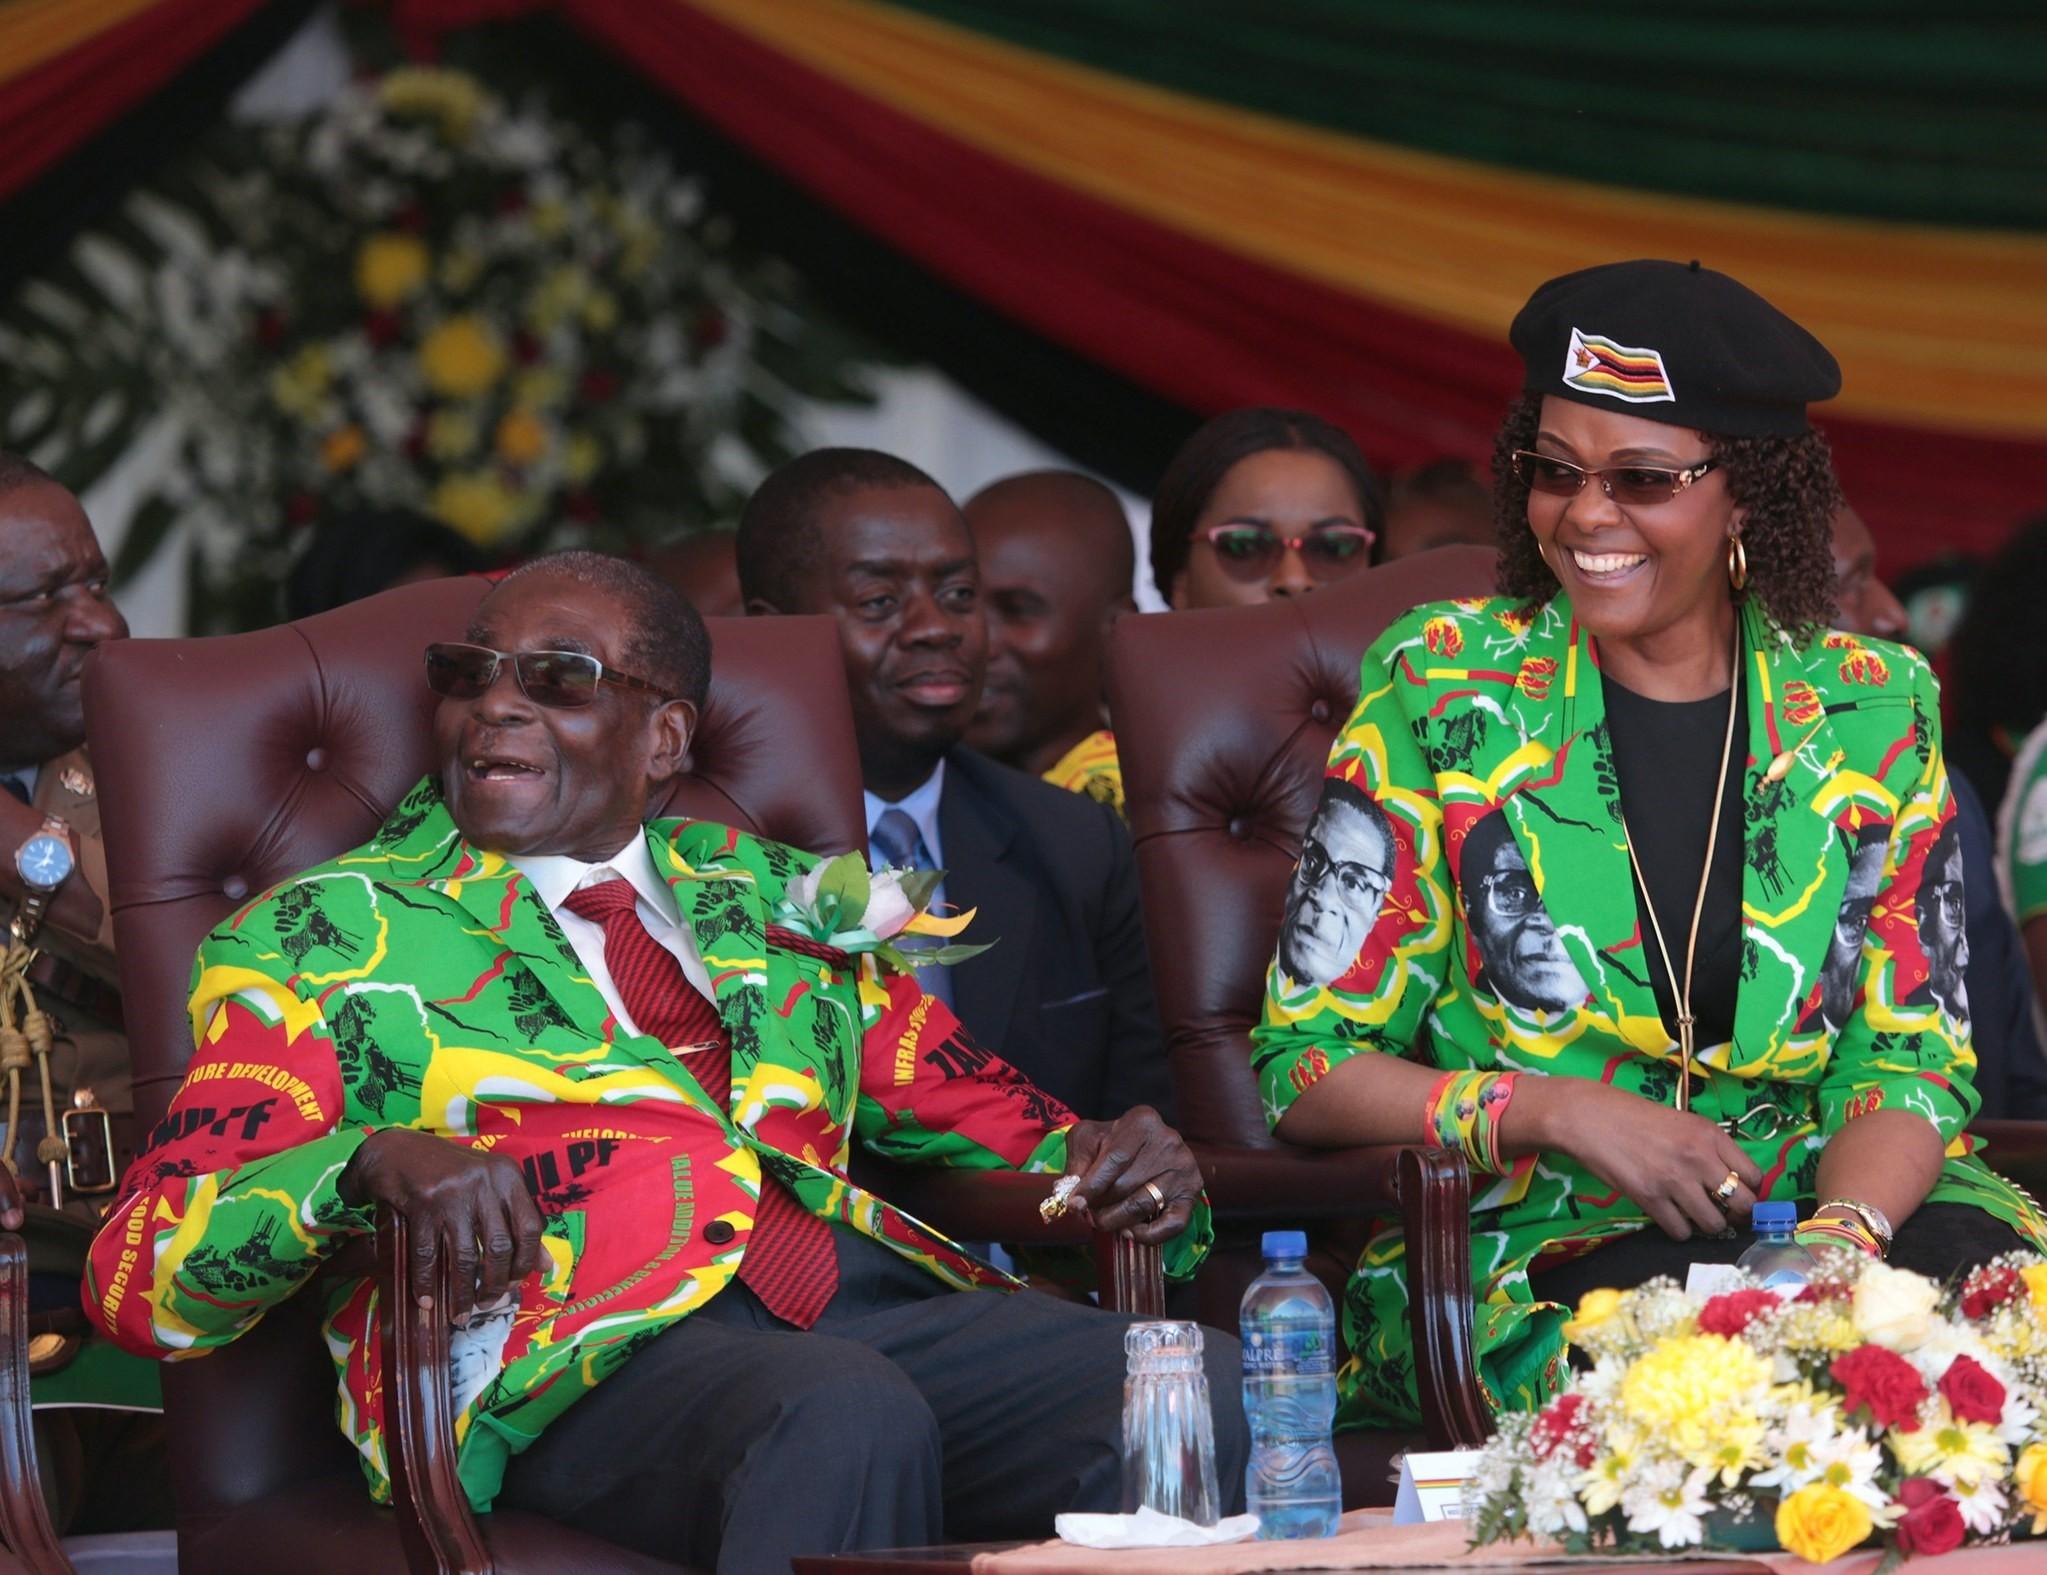 Zimbabwean President Robert Mugabe (L) and his wife Grace (R) smile after arriving at the Rudhaka Stadium in Marondera, 02 June 2017. (EPA Photo)